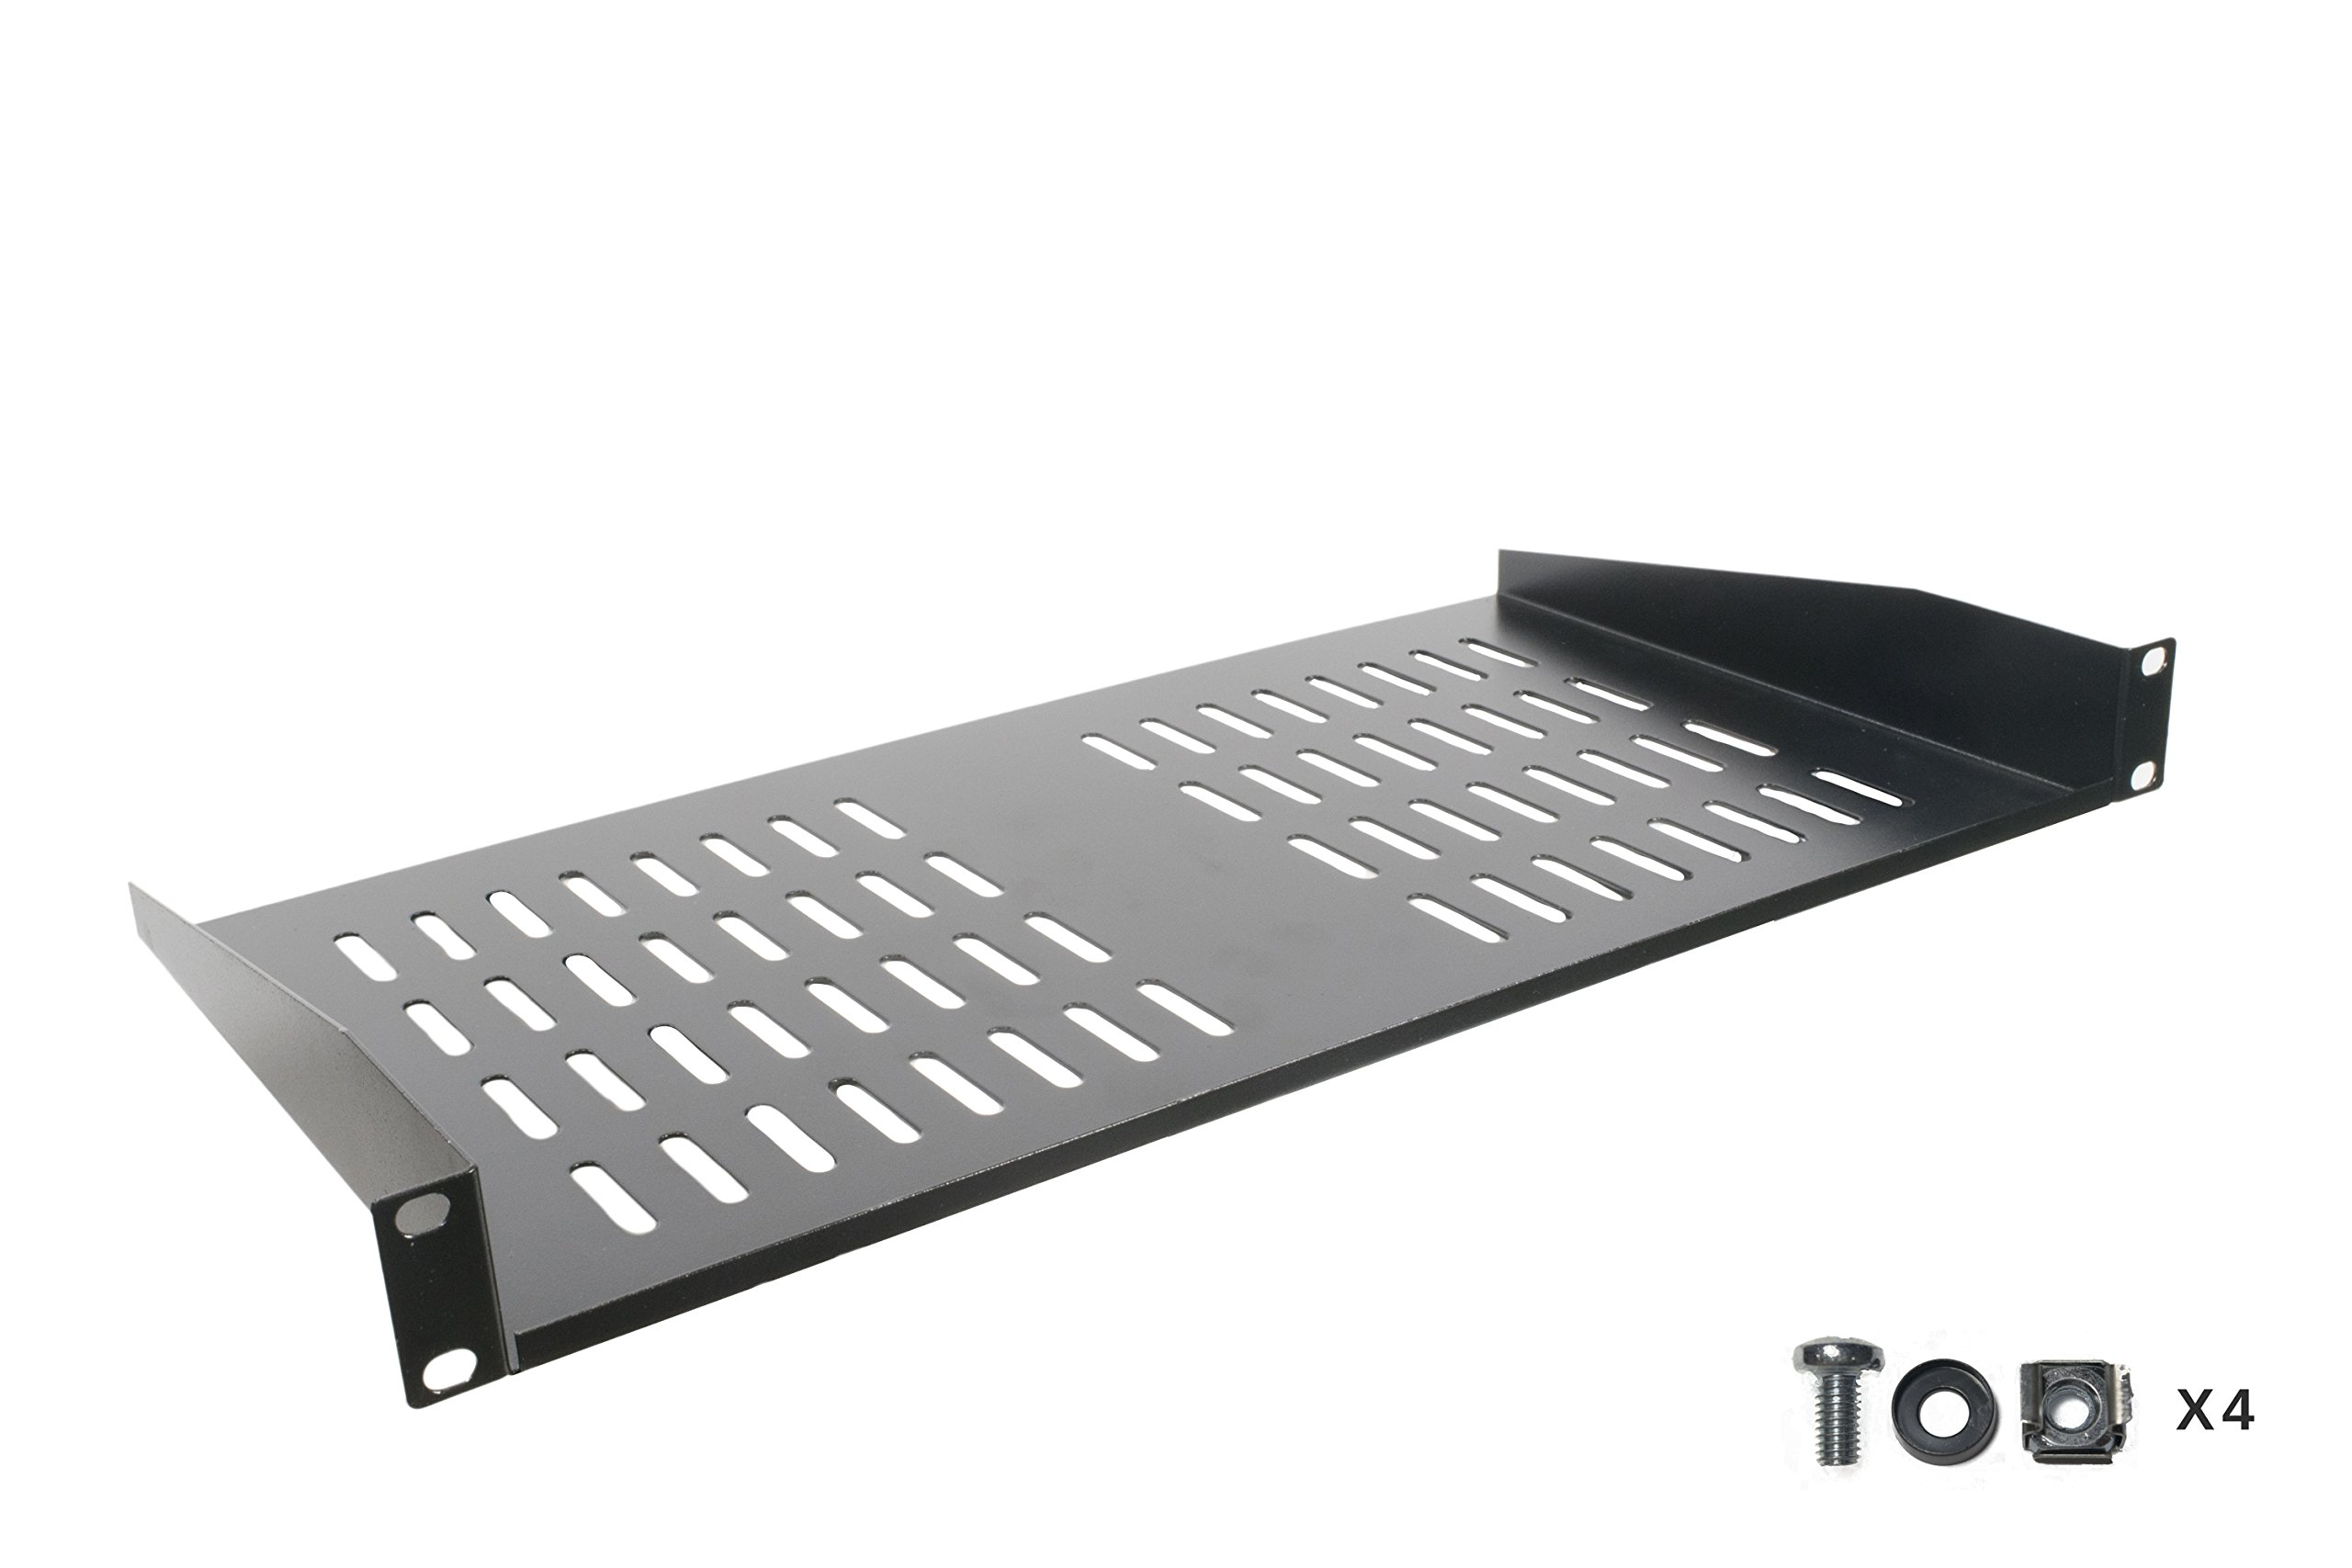 inch shelf mfg desktop dci rrtt open series post hammond rack frame products